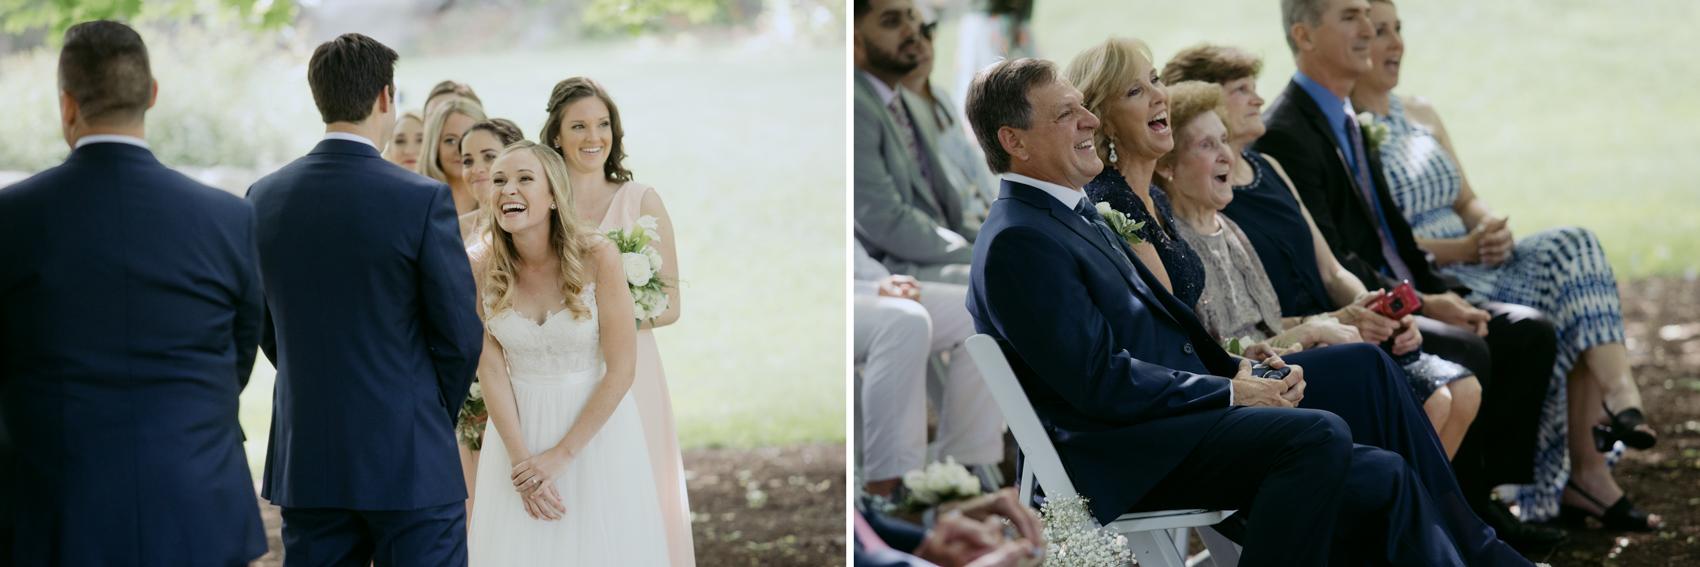 alli_dave_thompson_inn_portsmouth_new_Hampshire_wedding_009.jpg